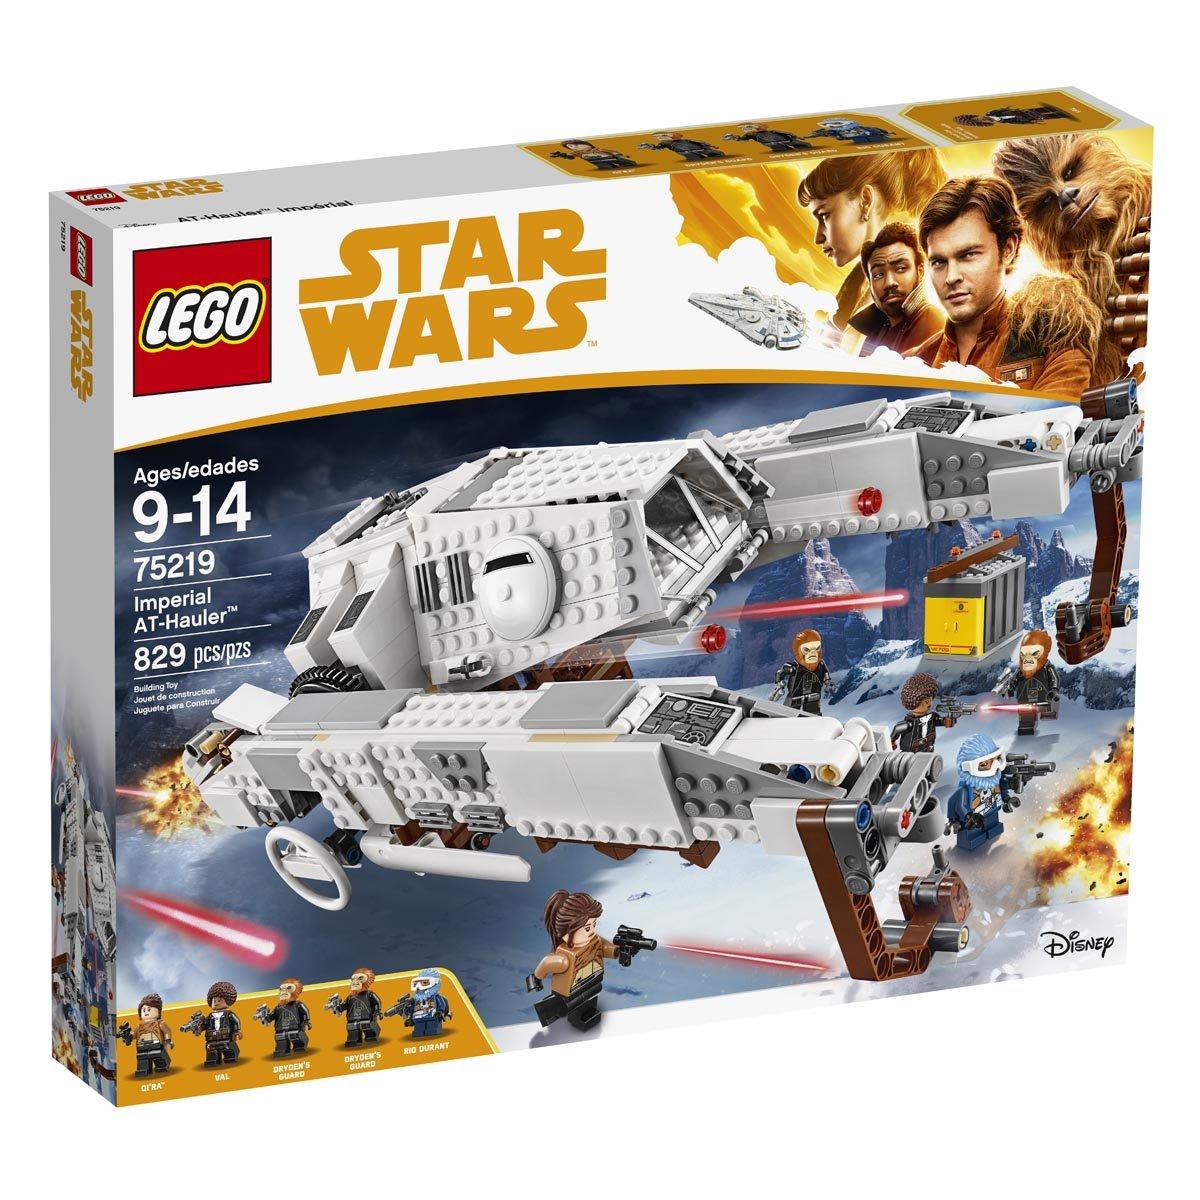 Star Wars Imperial At Hauler Lego